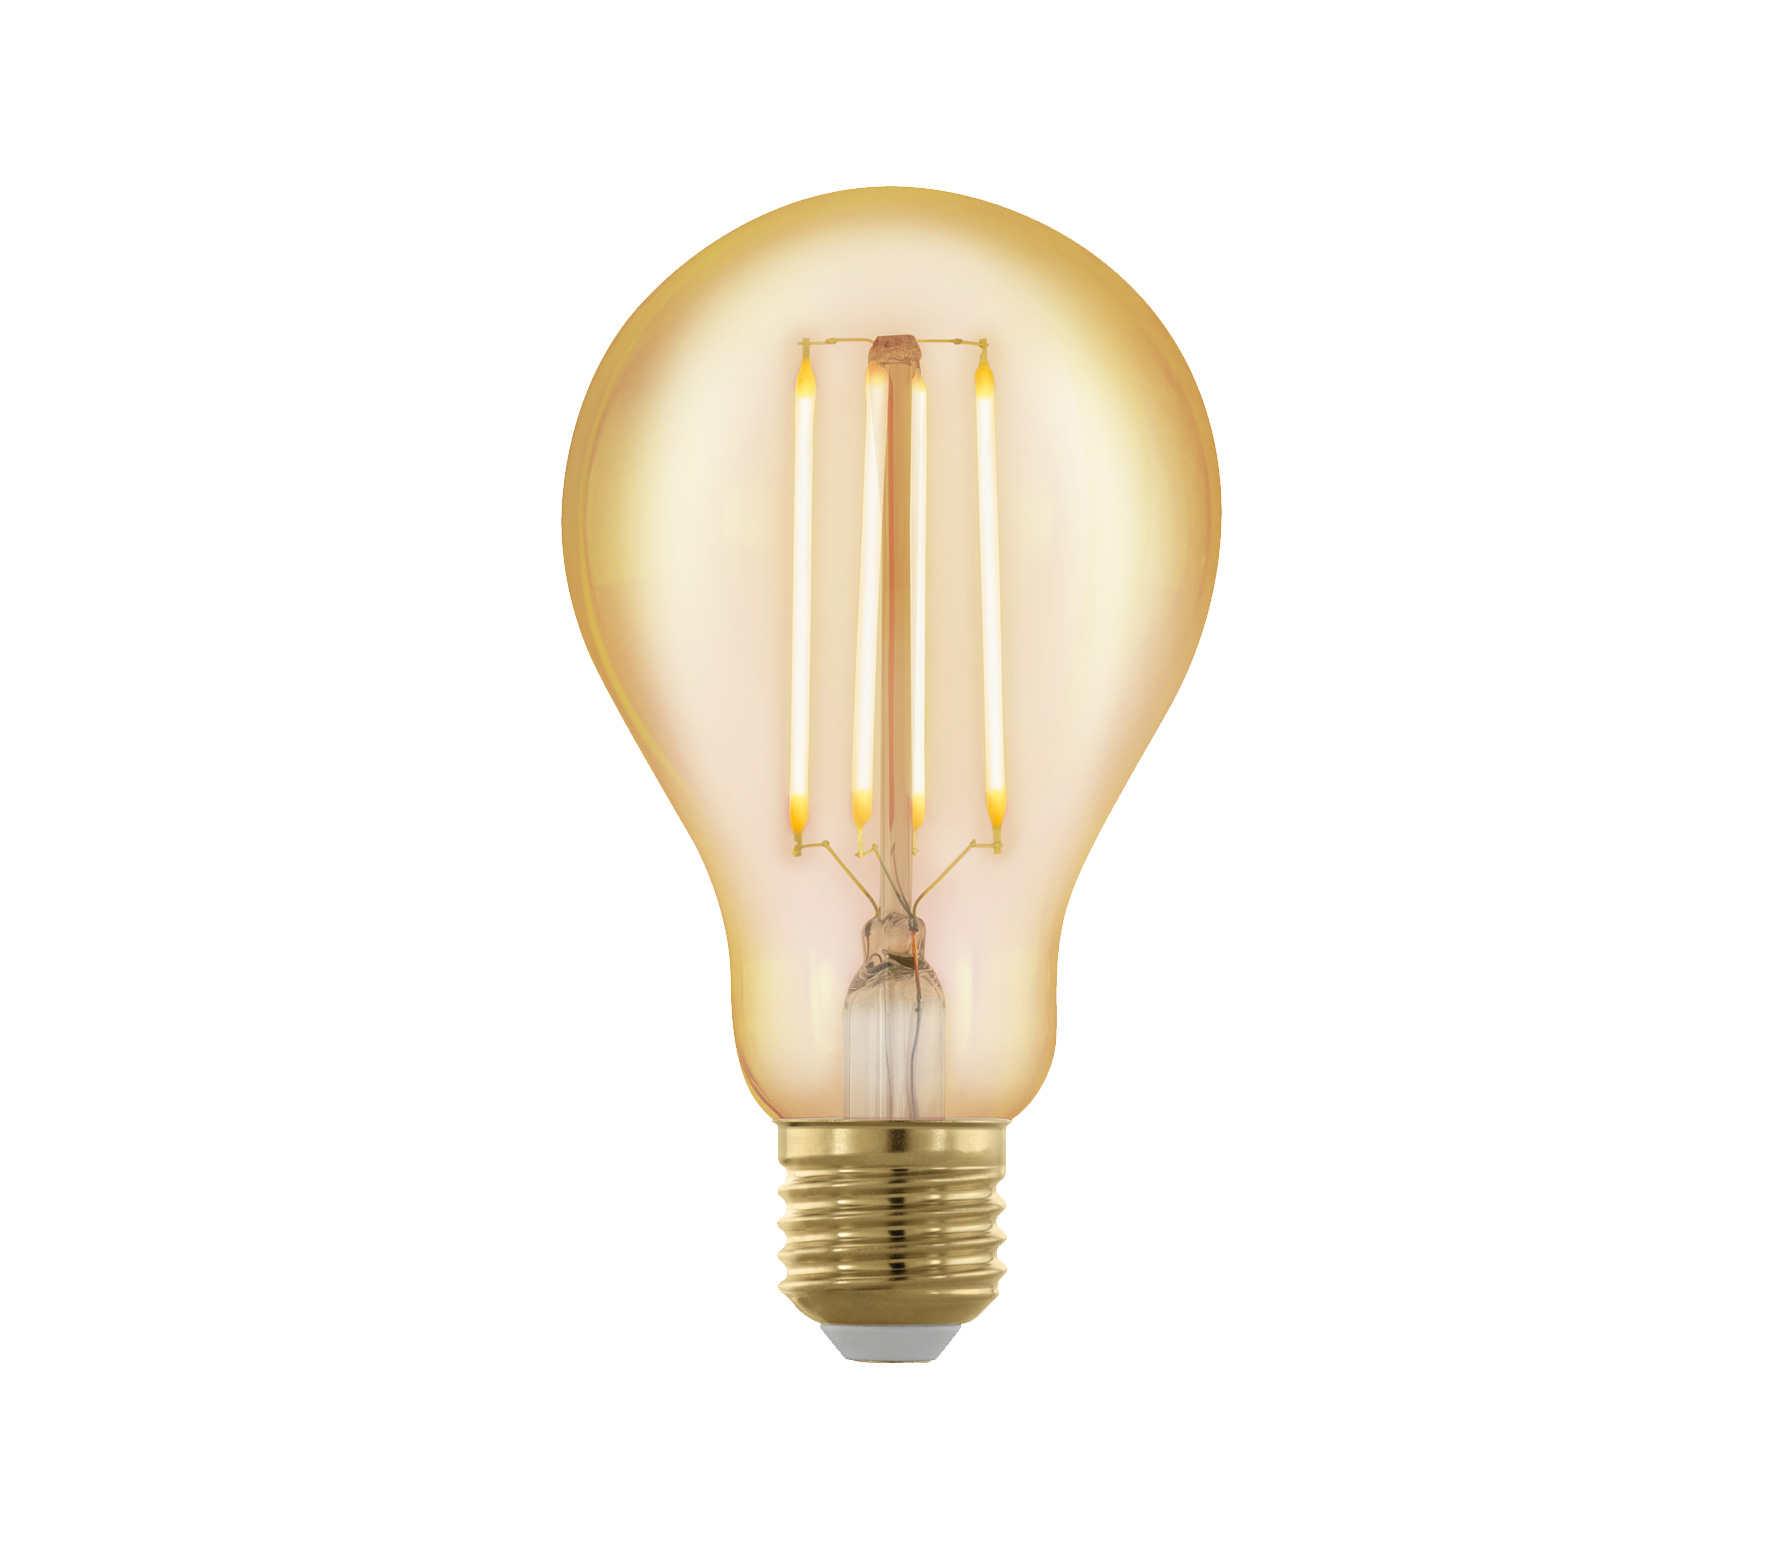 Lichtbron LED-lamp peer dimbaar, ø 7,5 cm E-27 wordt gratis ...